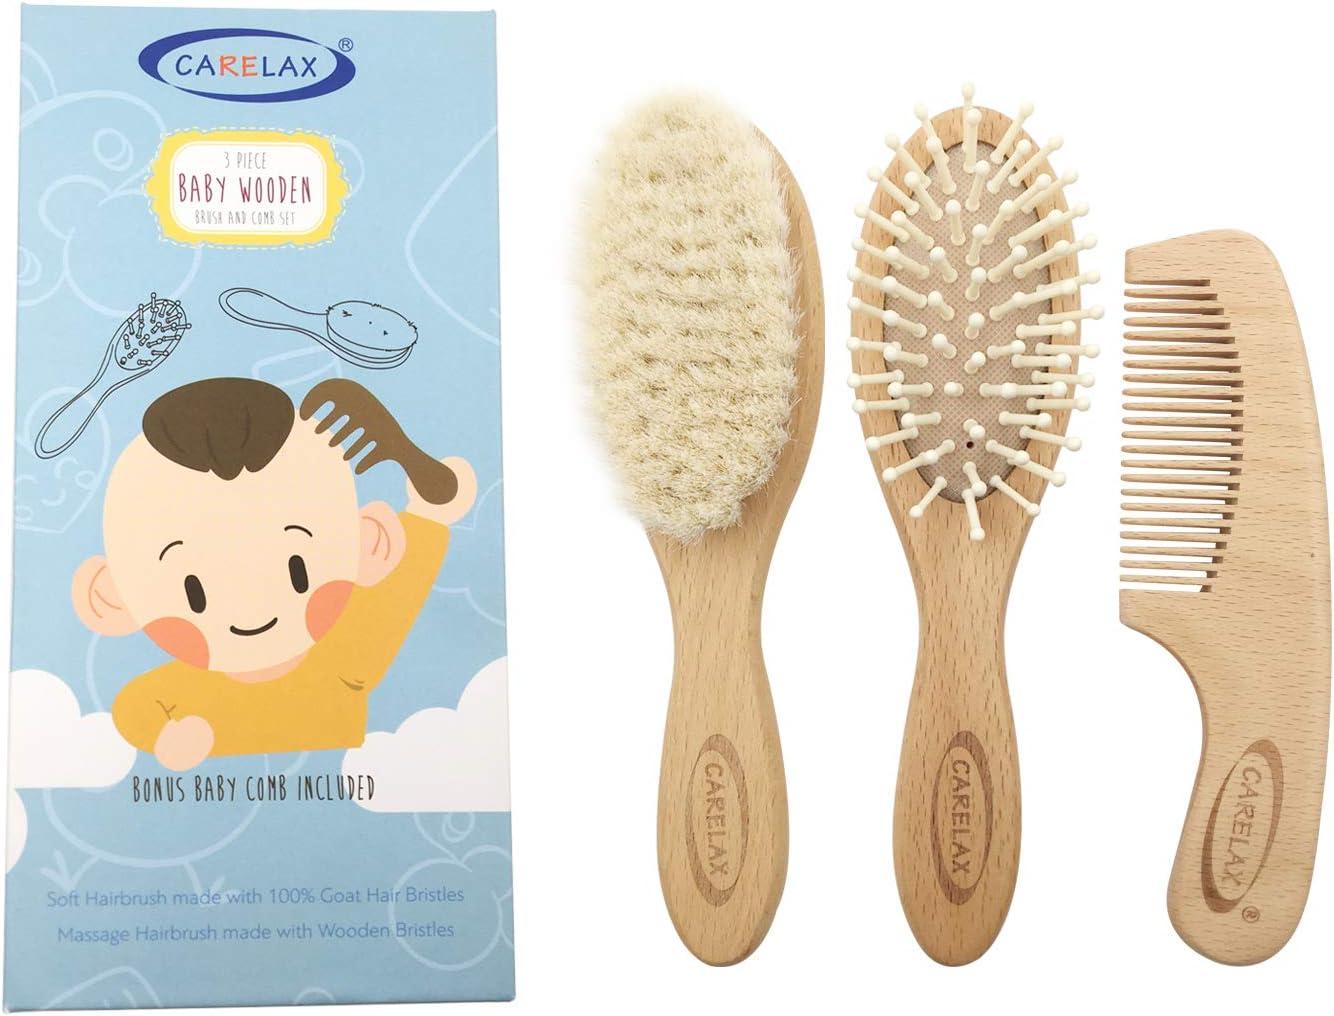 Baby Hair Brush Comb Indefinitely Set Organic Hairbrush Ranking TOP15 Goa Wooden Natural